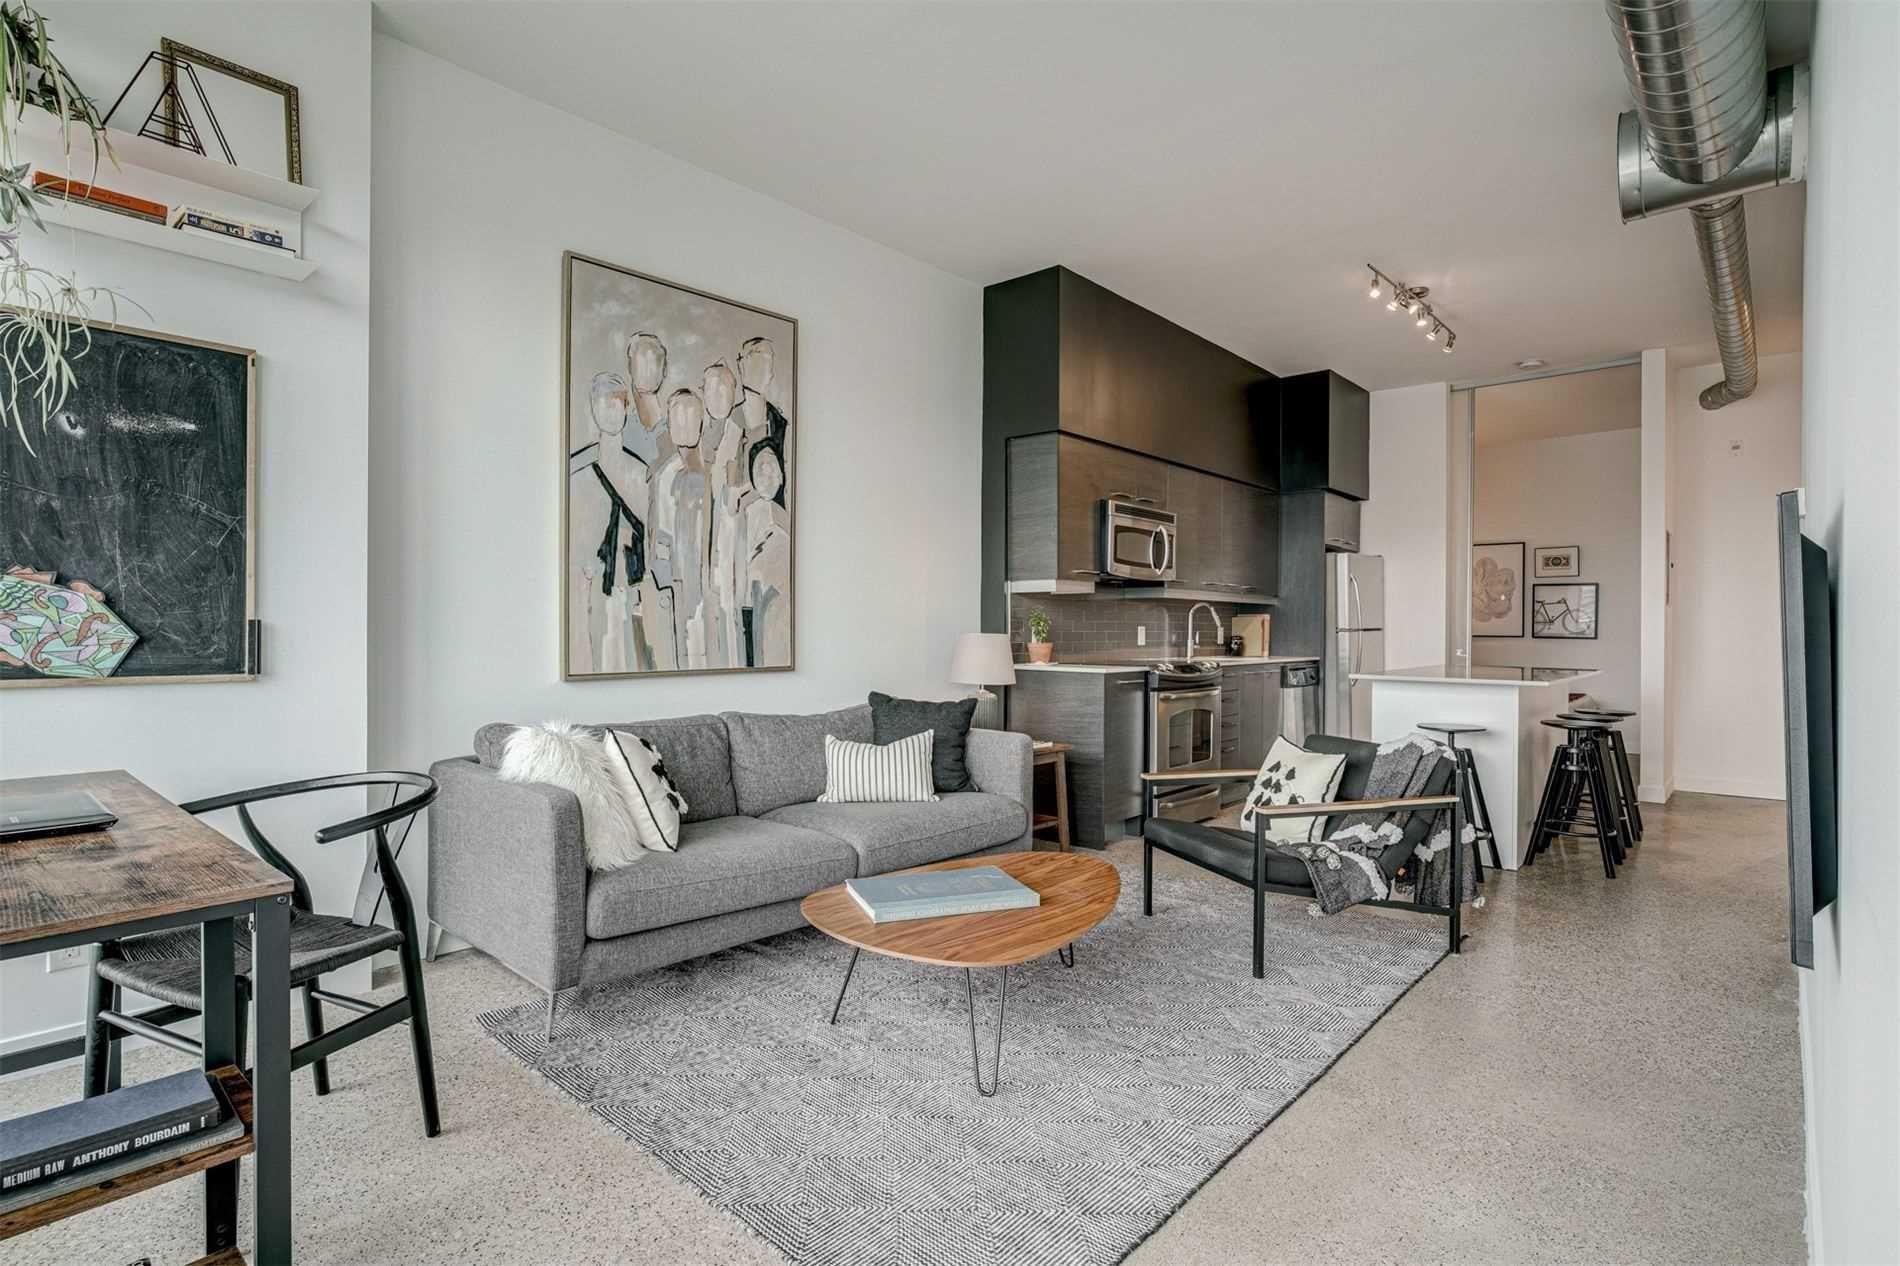 Main Photo: Ph815 510 E King Street in Toronto: Moss Park Condo for sale (Toronto C08)  : MLS®# C5228871